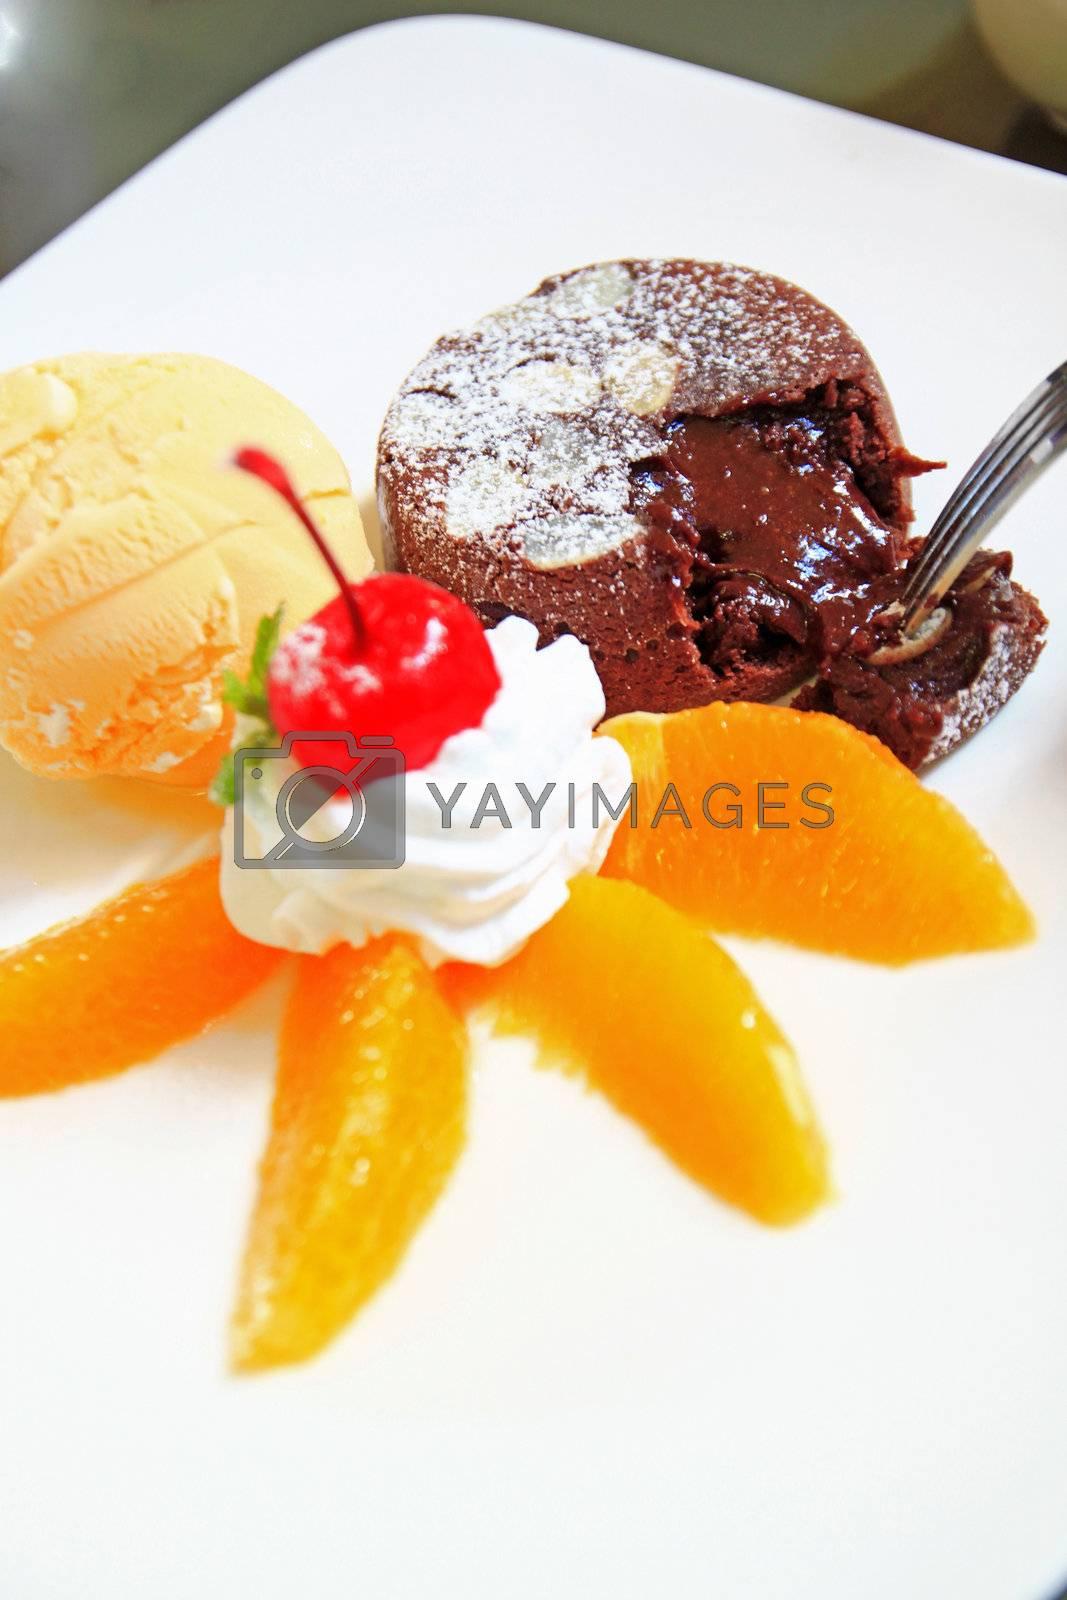 hot chocolate cake with ice cream and orange